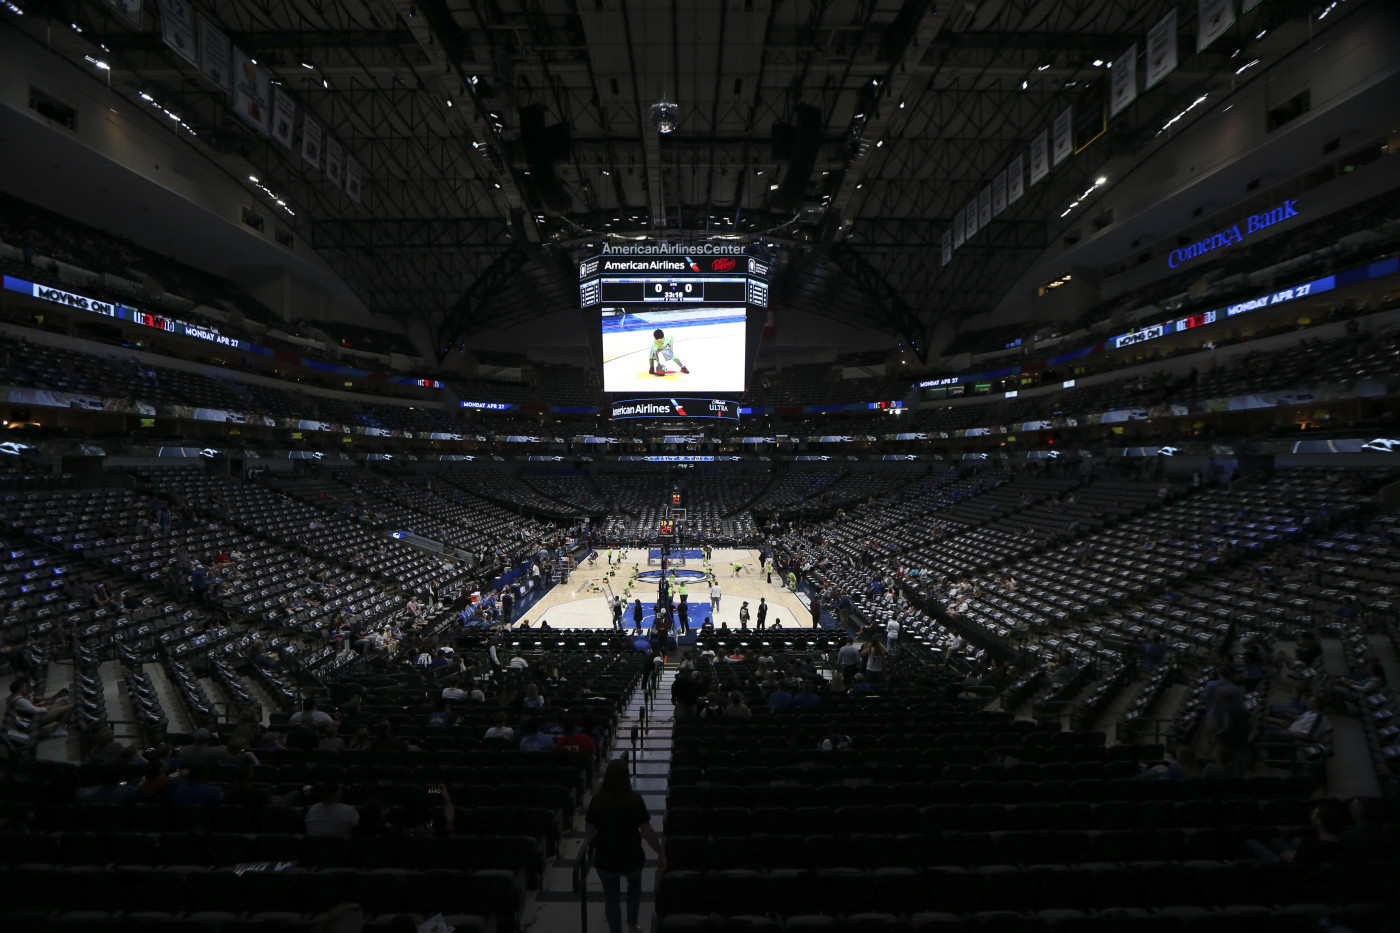 Dallas American Airlines Arena March 2020